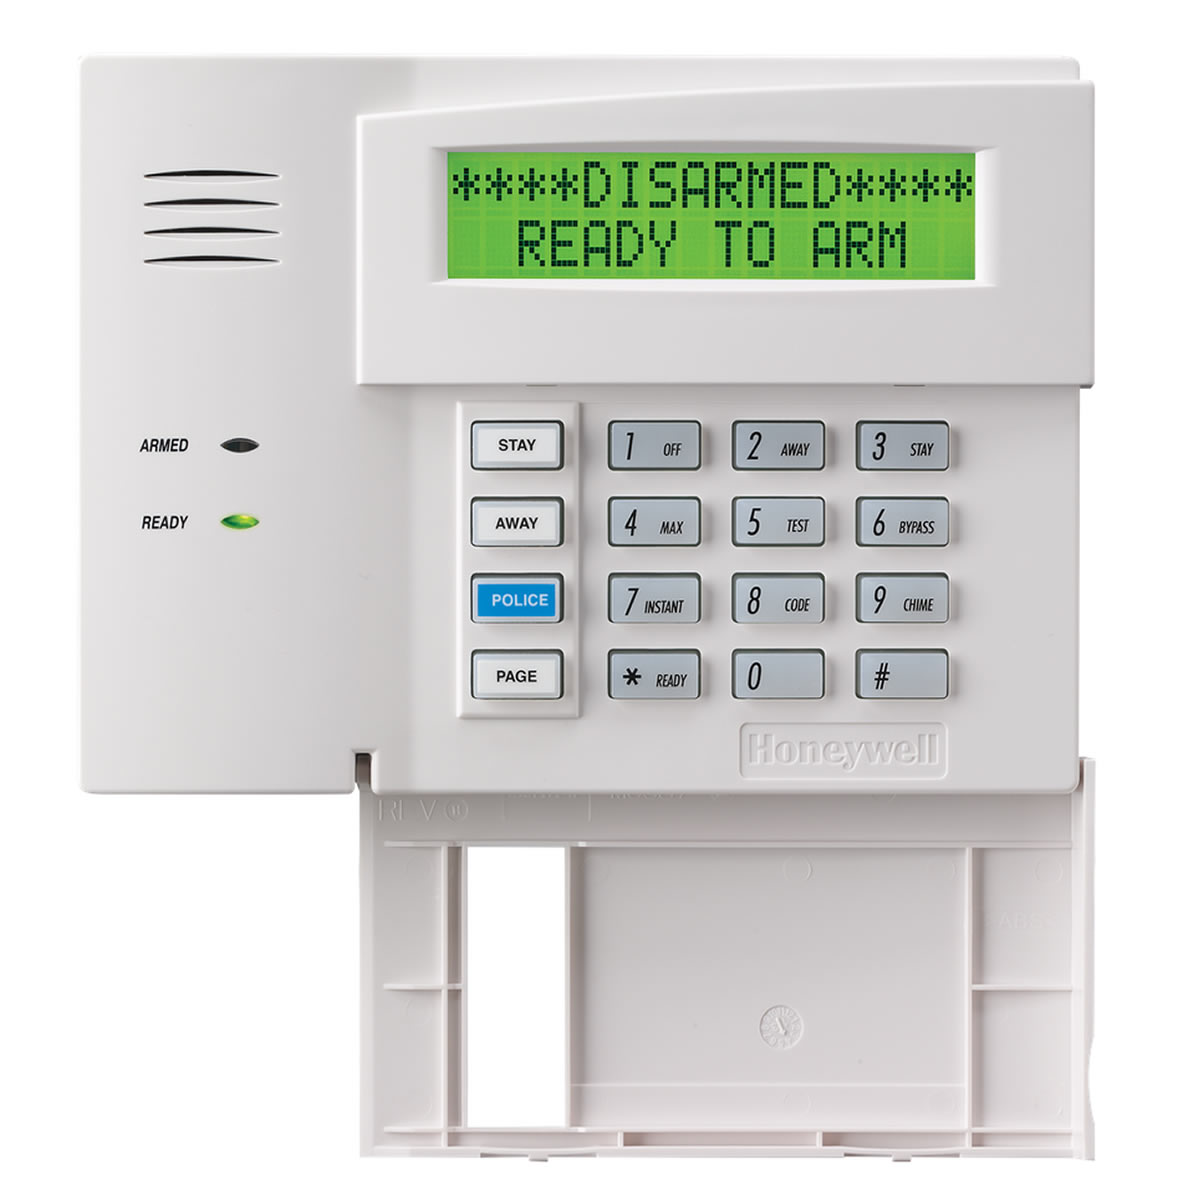 Honeywell 6150RF Keypad – SI Alarms Ltd